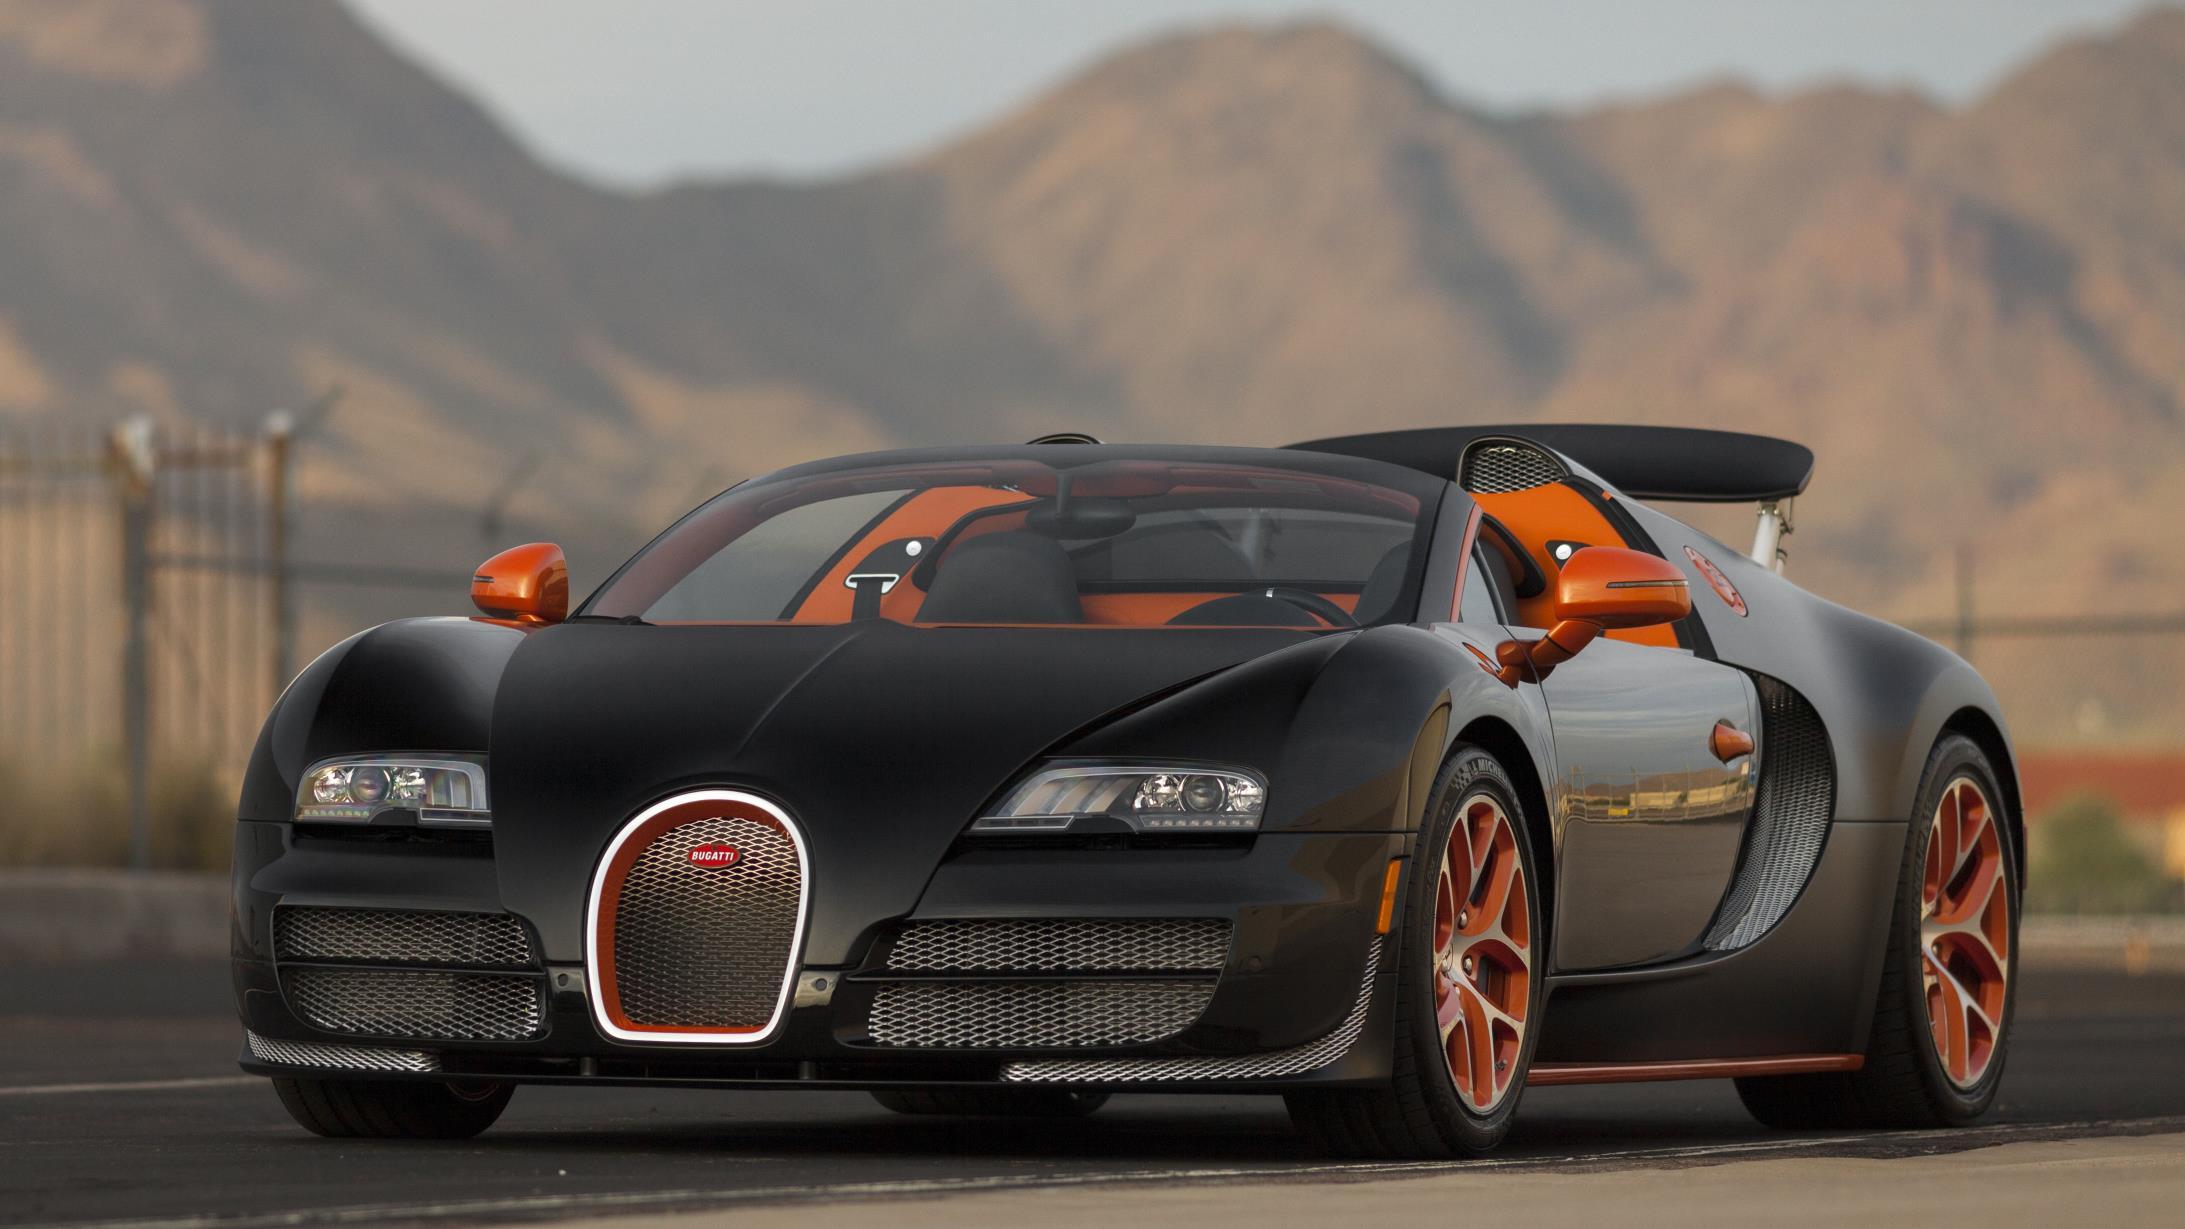 floyd-mayweather-s-koenigsegg-ccxr-trevita-is-up-for-grabs_4 Extraordinary Bugatti Veyron Grand Sport Vitesse Real Racing 3 Cars Trend